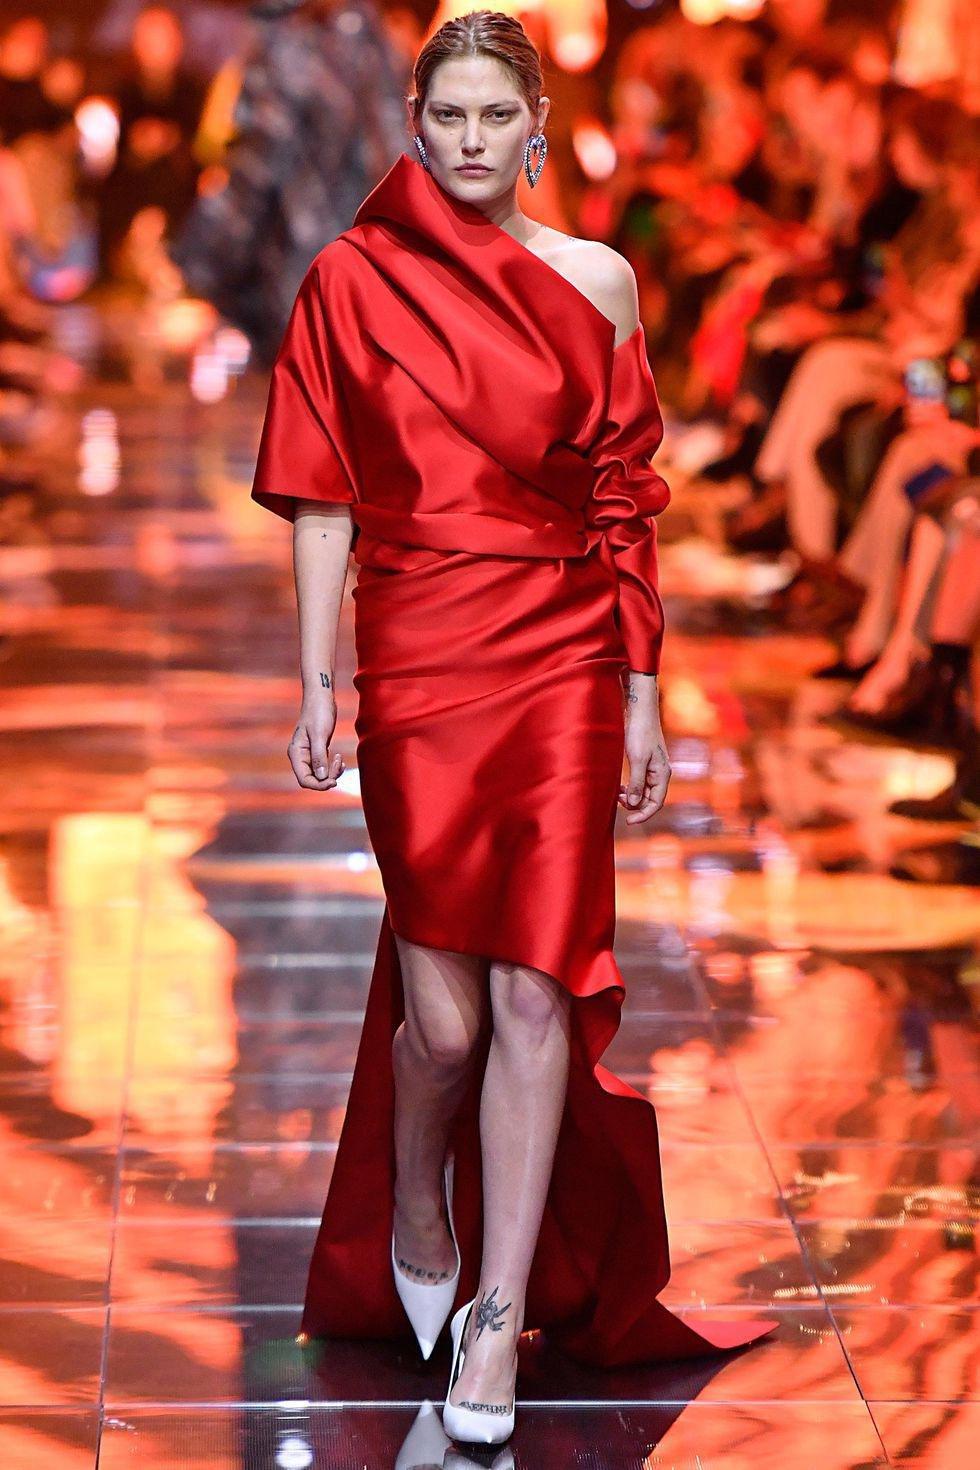 5e327f6389f90 Balenciaga فستان سهرة طويل فساتين سهرة صيفية فساتين صيف ربيع 2019 بالنسياغا